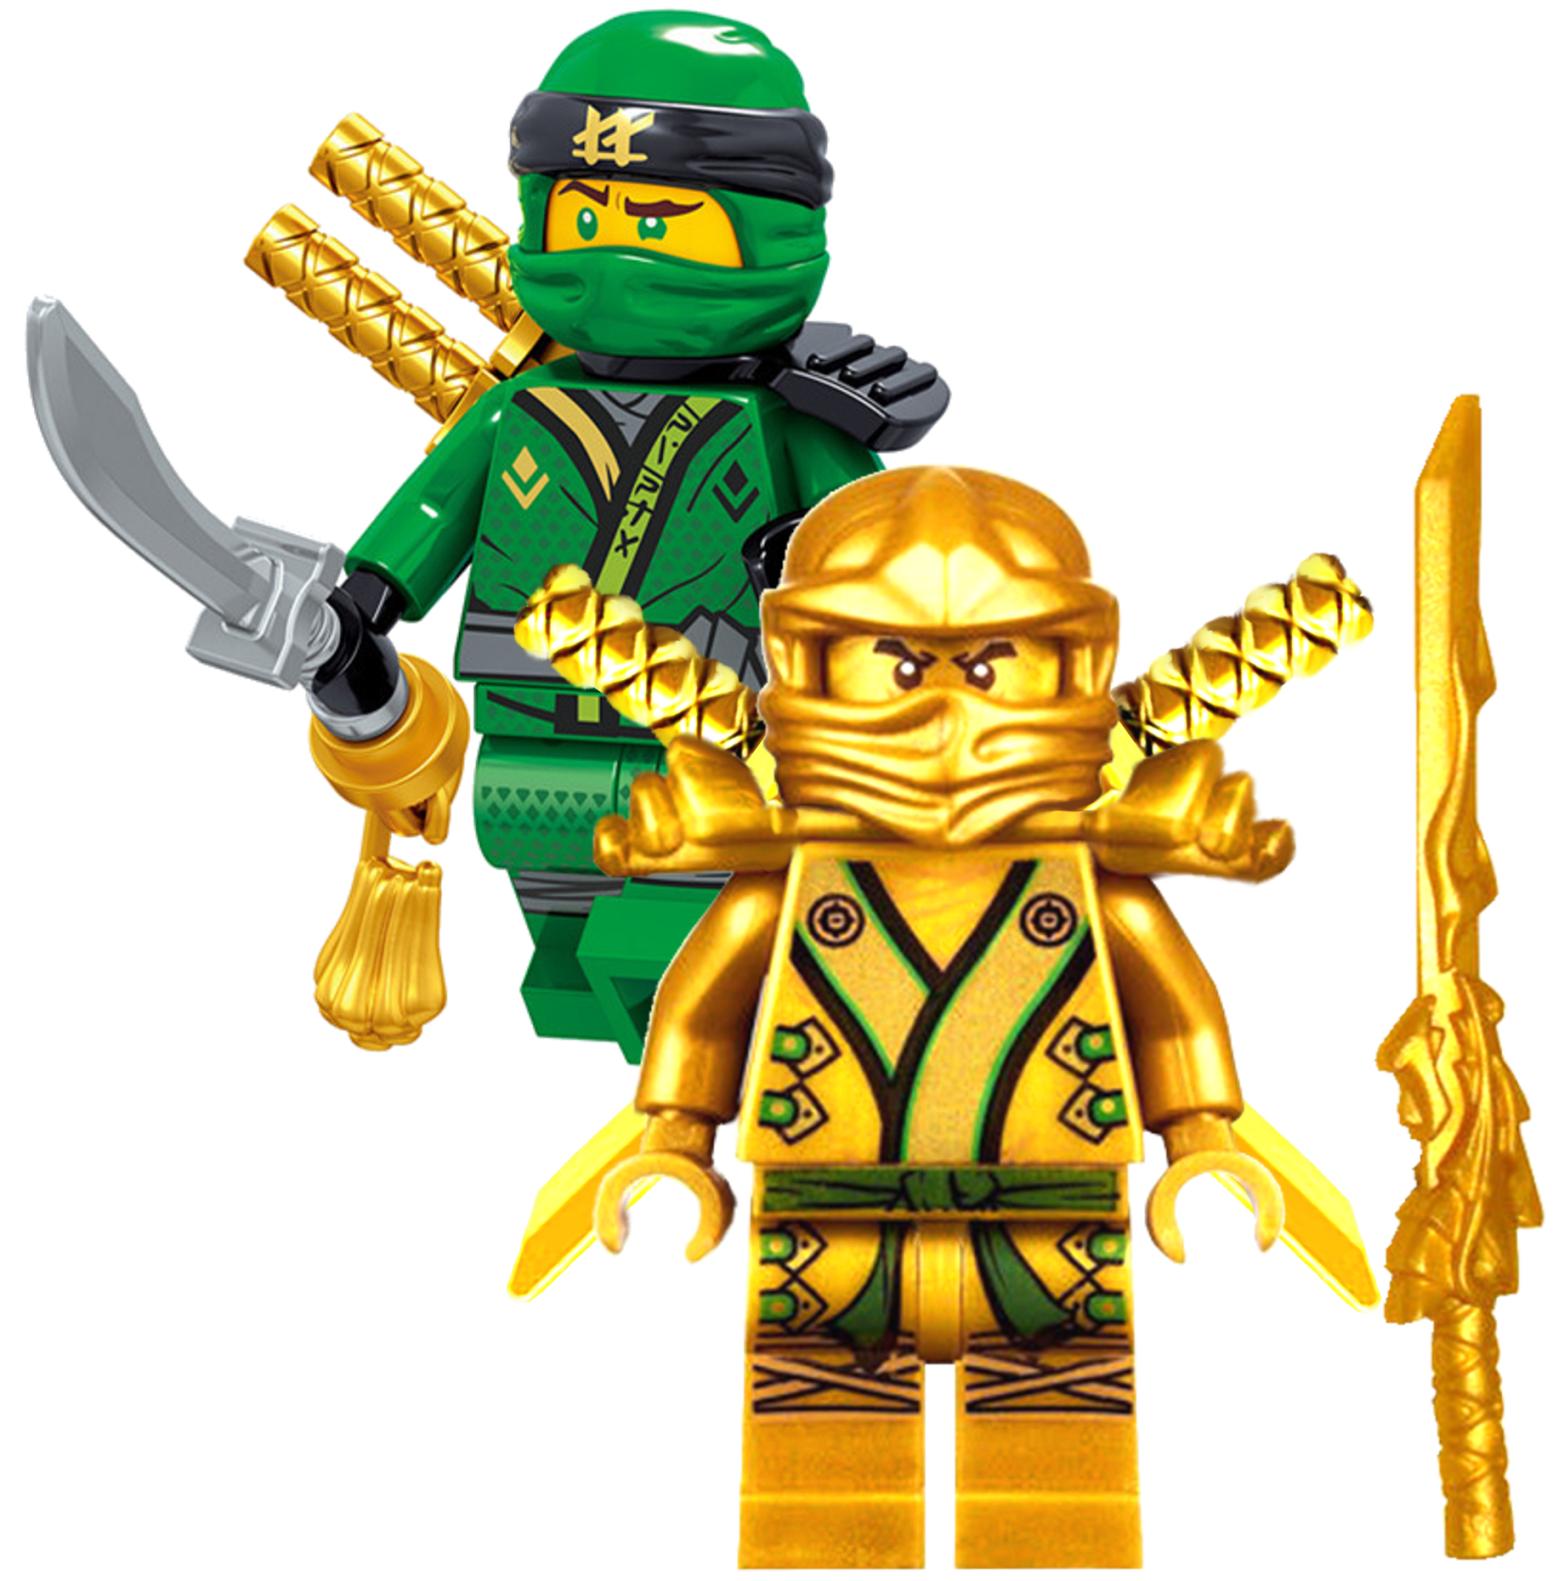 6 LEGO Ninjago Mini Figure Weapon Gold Sword Blade